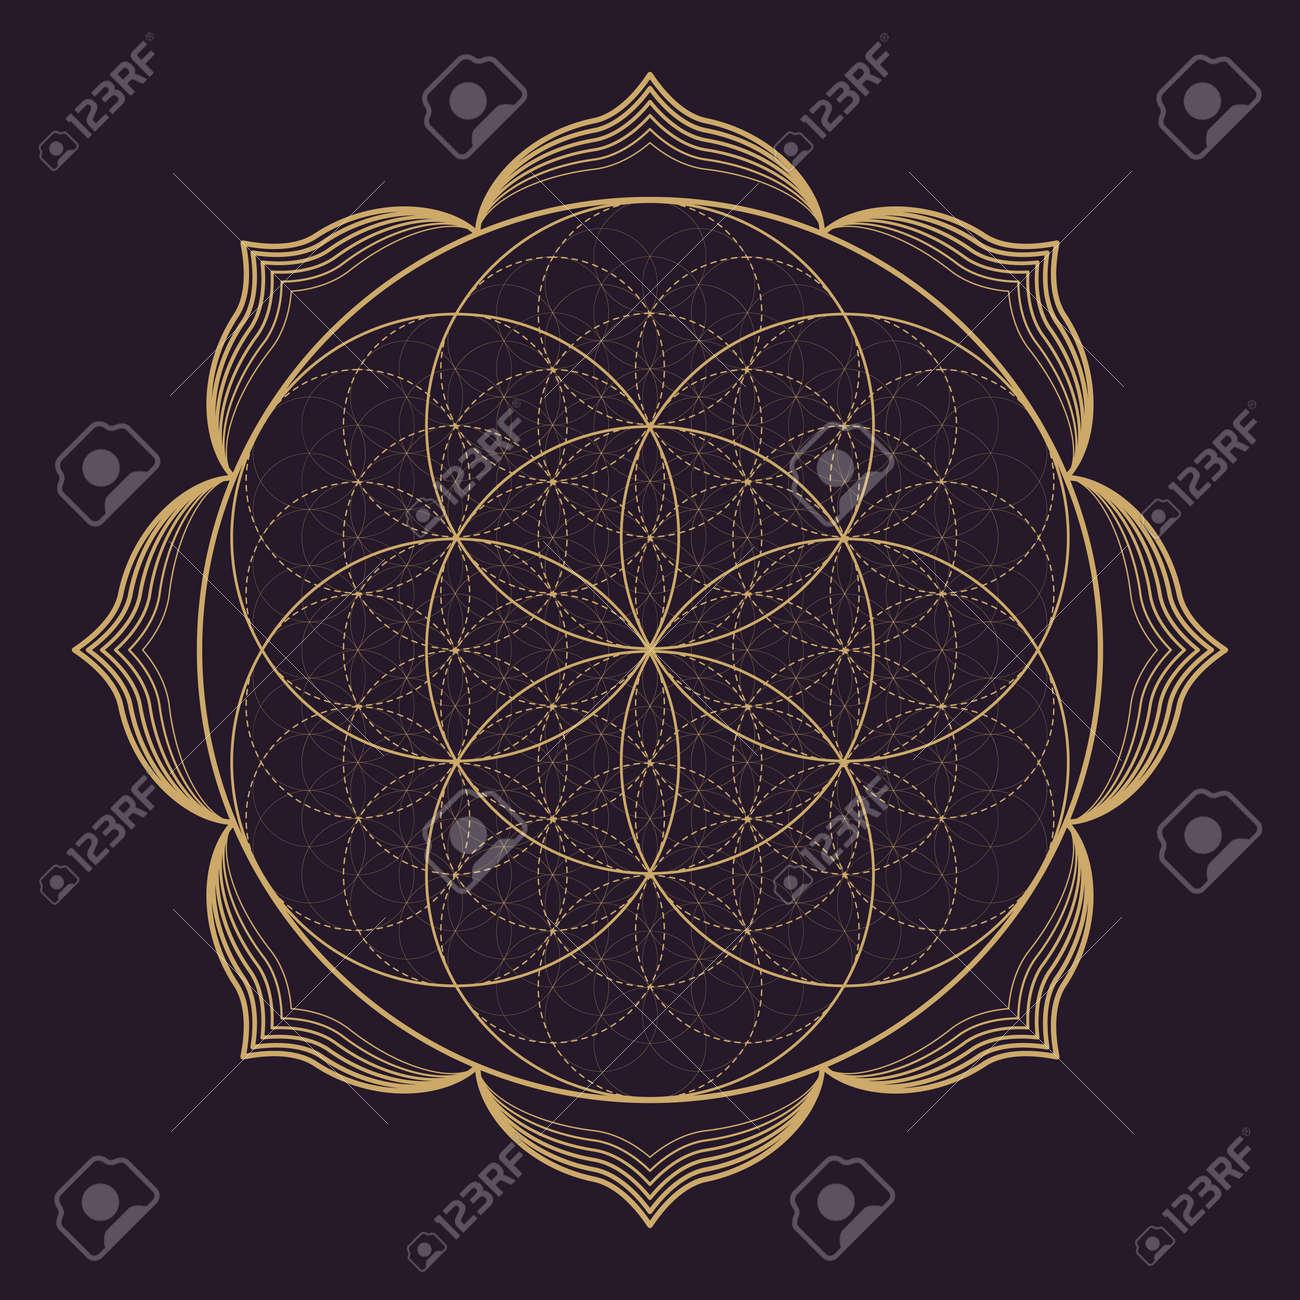 Vector Gold Monochrome Design Abstract Mandala Sacred Geometry